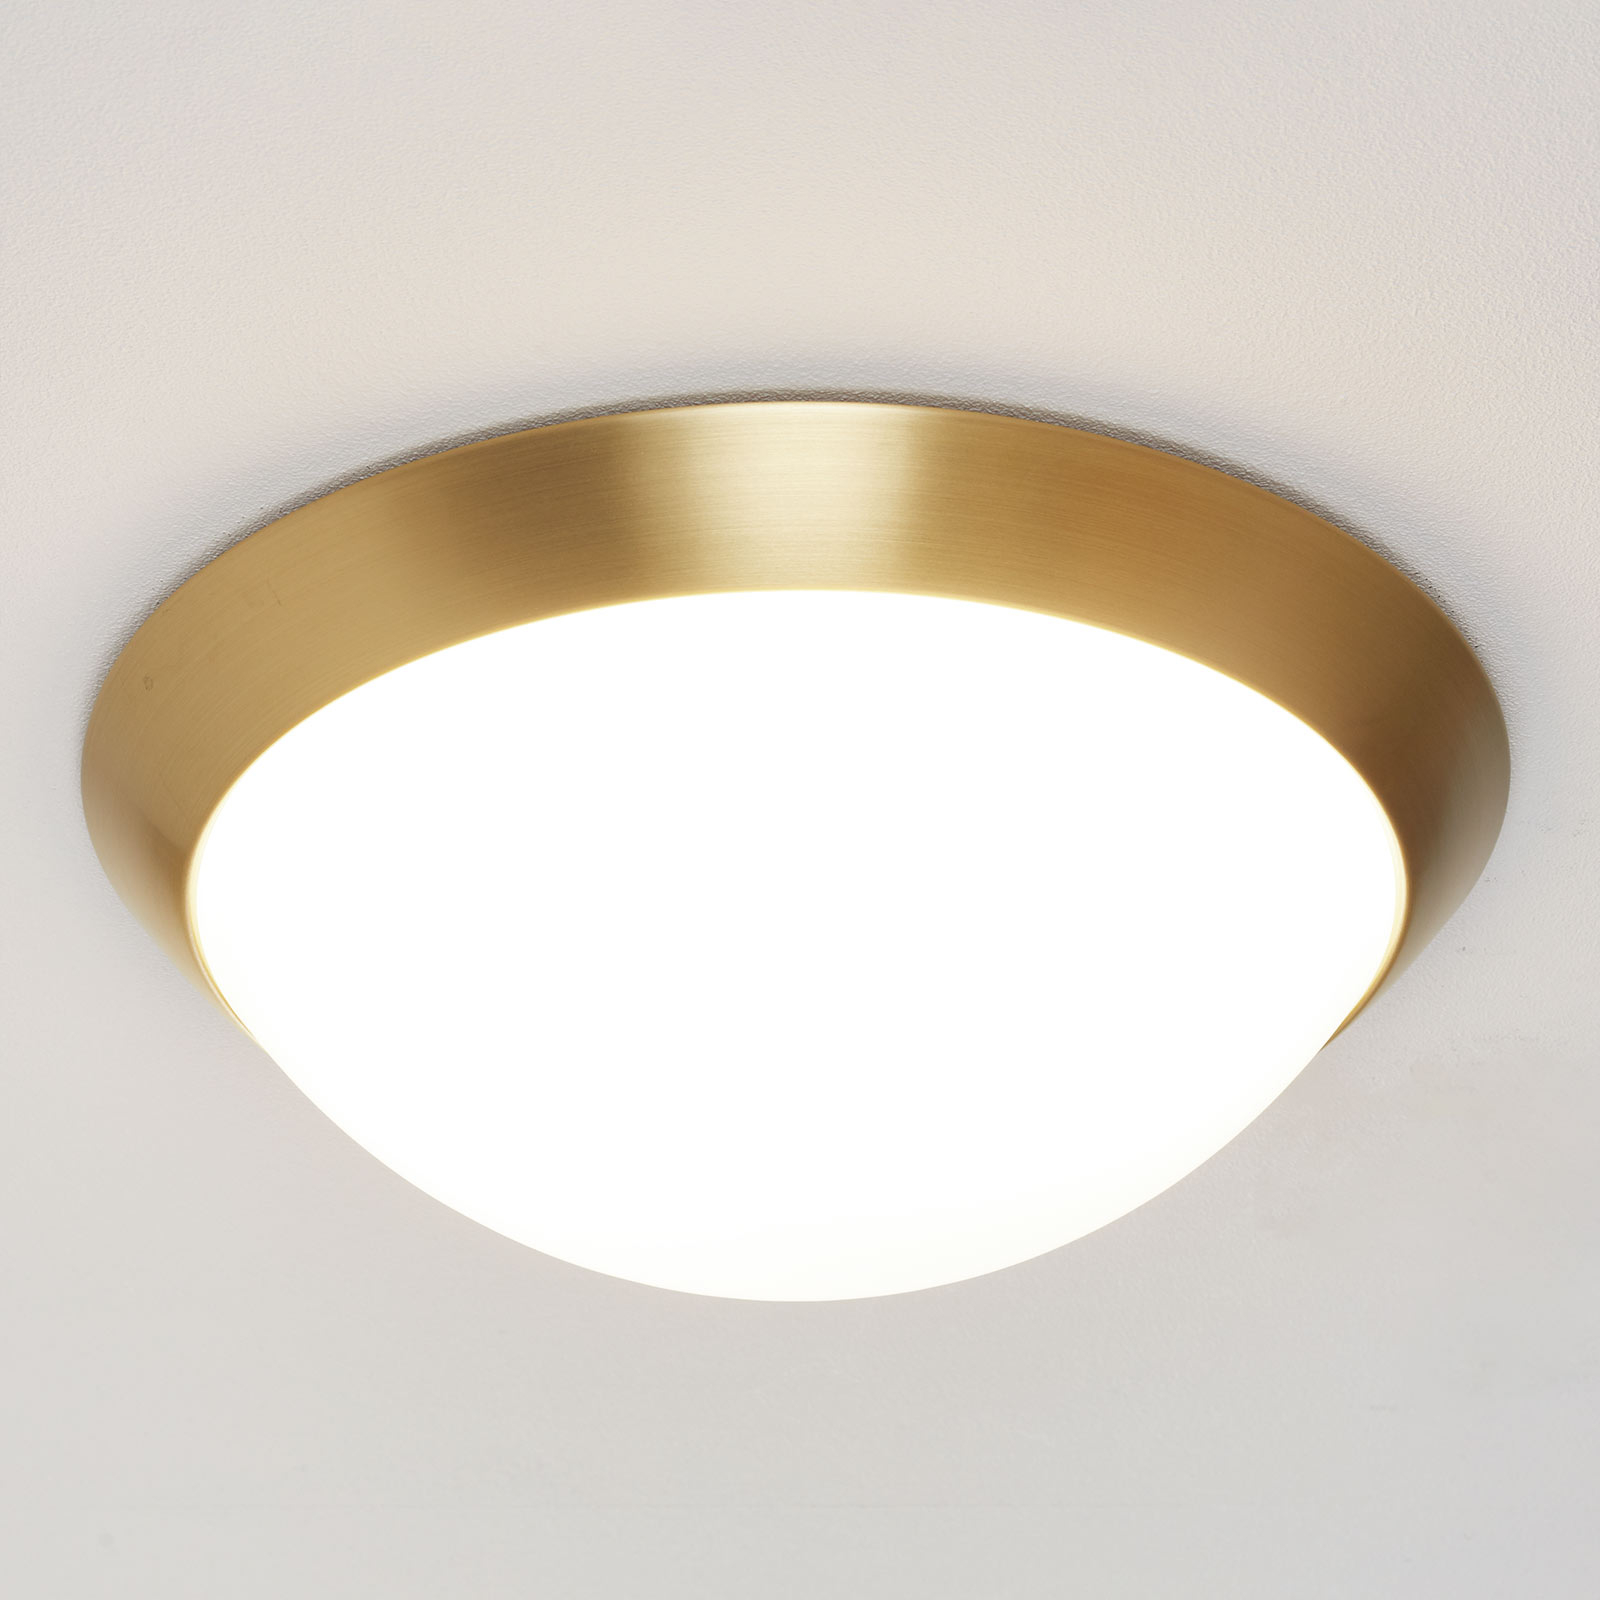 Katrin - Ceiling Light in Brass Look IP44_4536103_1